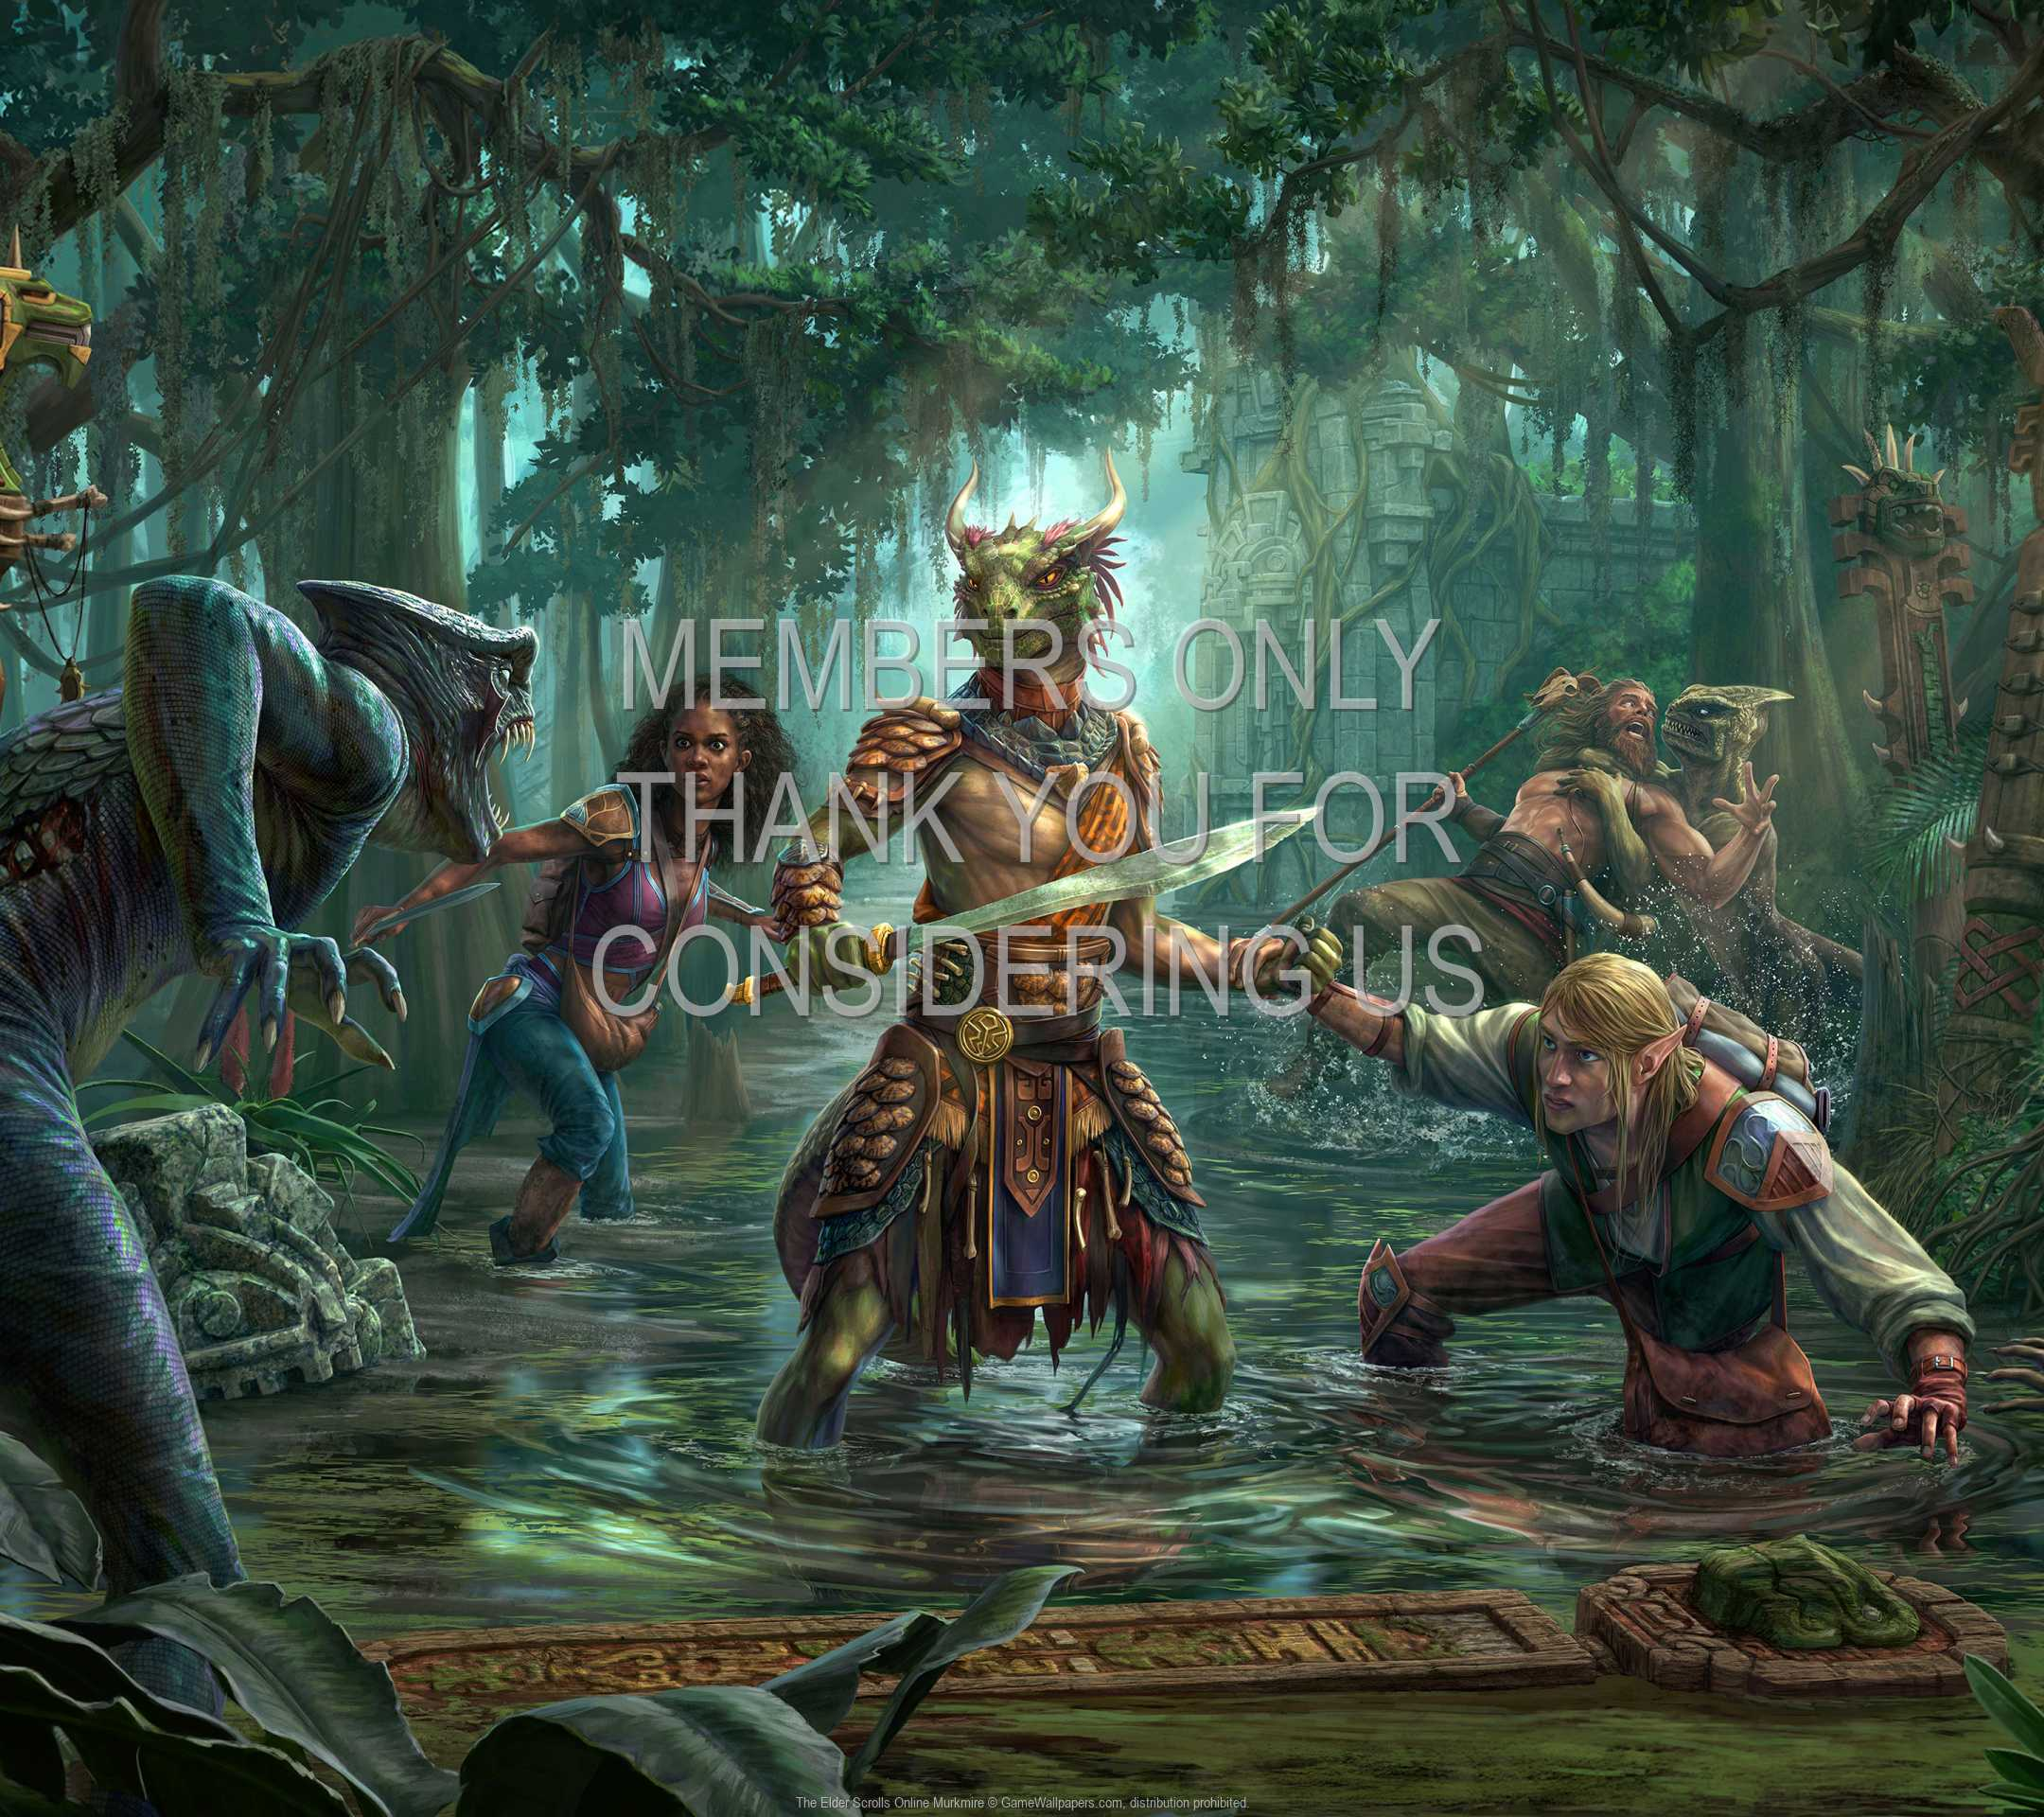 The Elder Scrolls Online: Murkmire 1080p Horizontal Mobile wallpaper or background 01